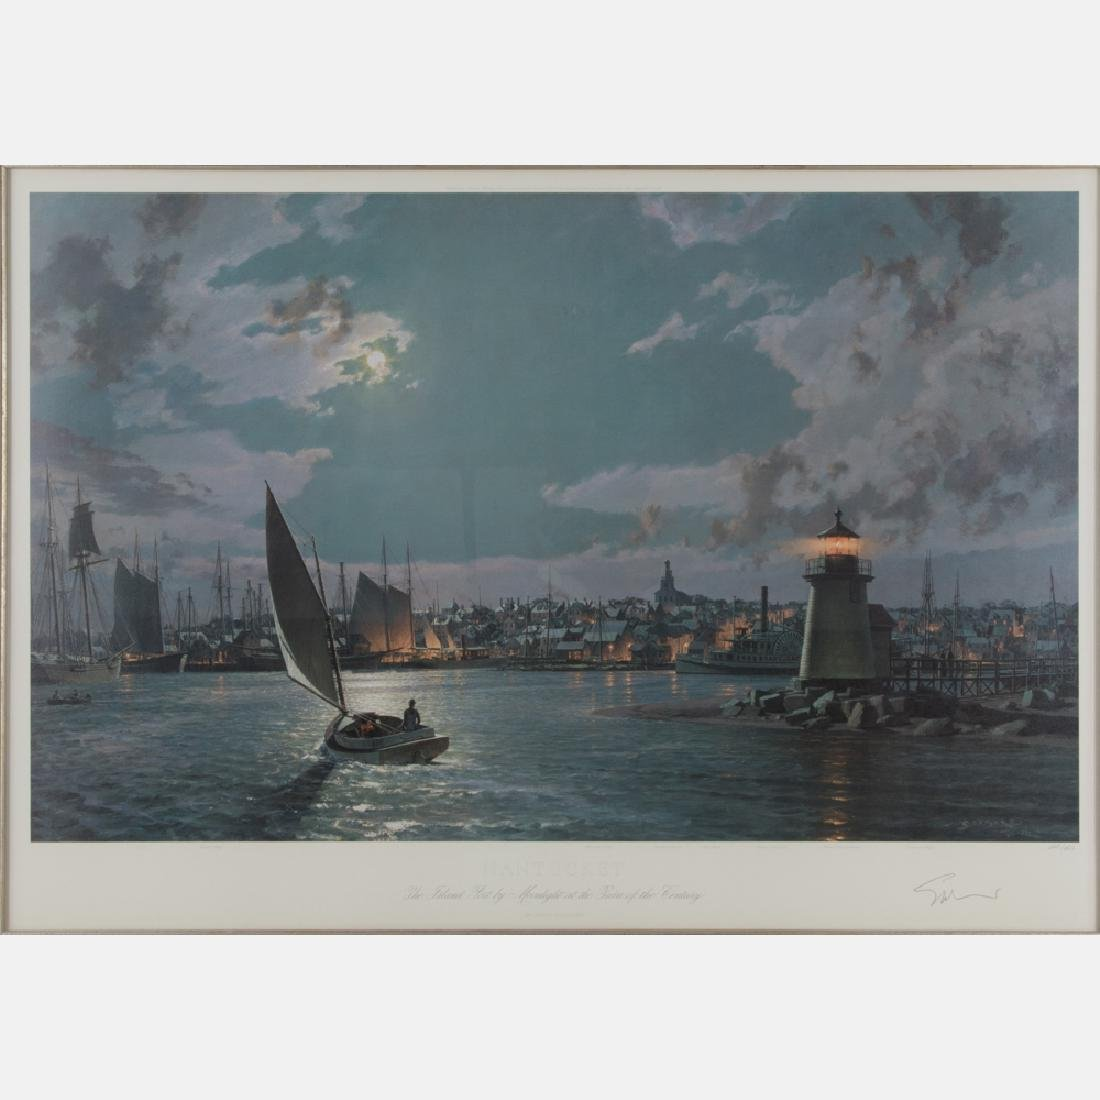 John Stobart (b. 1929) Nantucket, the Island Port by